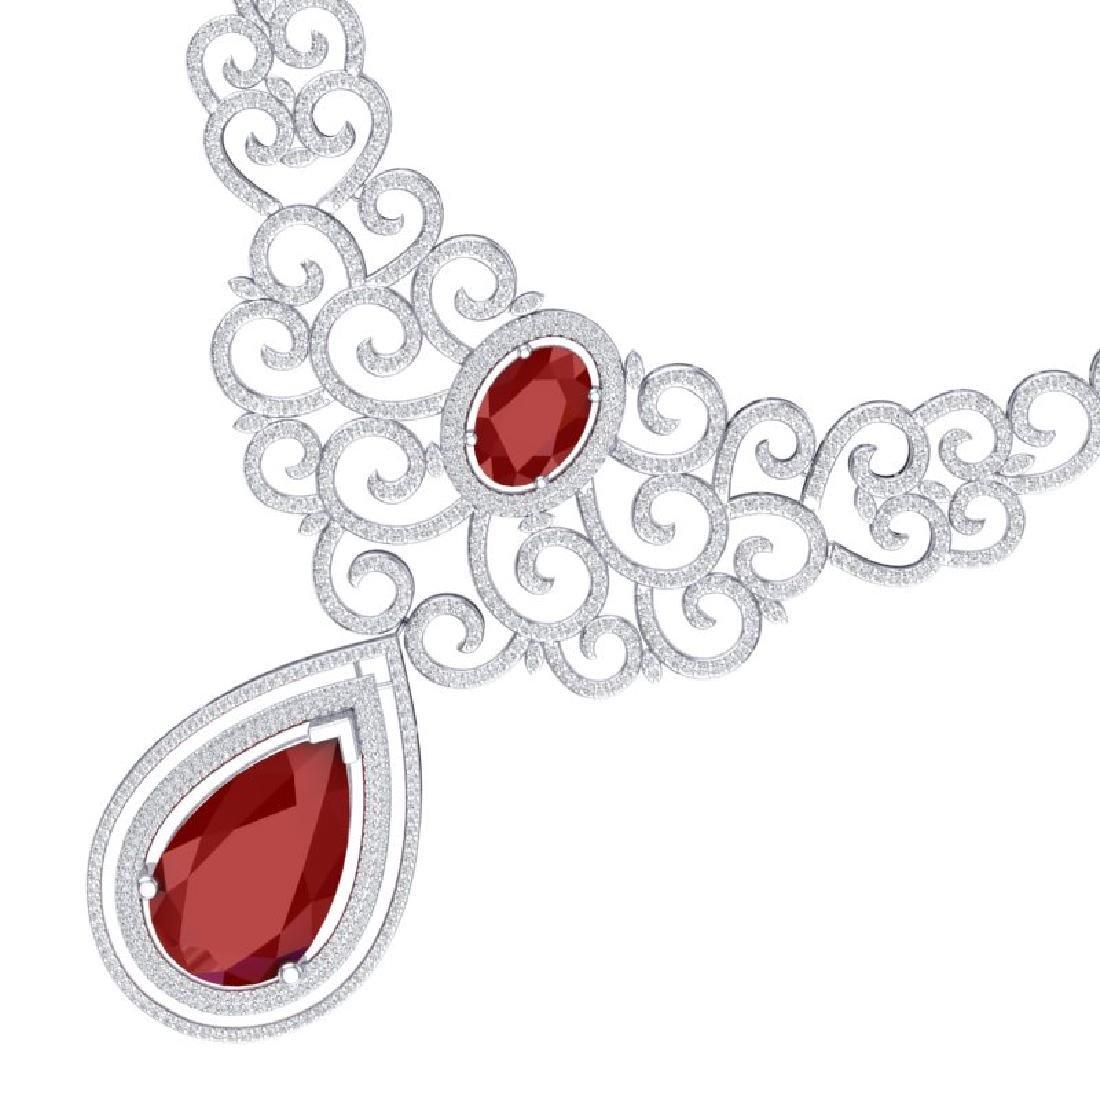 87.52 CTW Royalty Ruby & VS Diamond Necklace 18K White